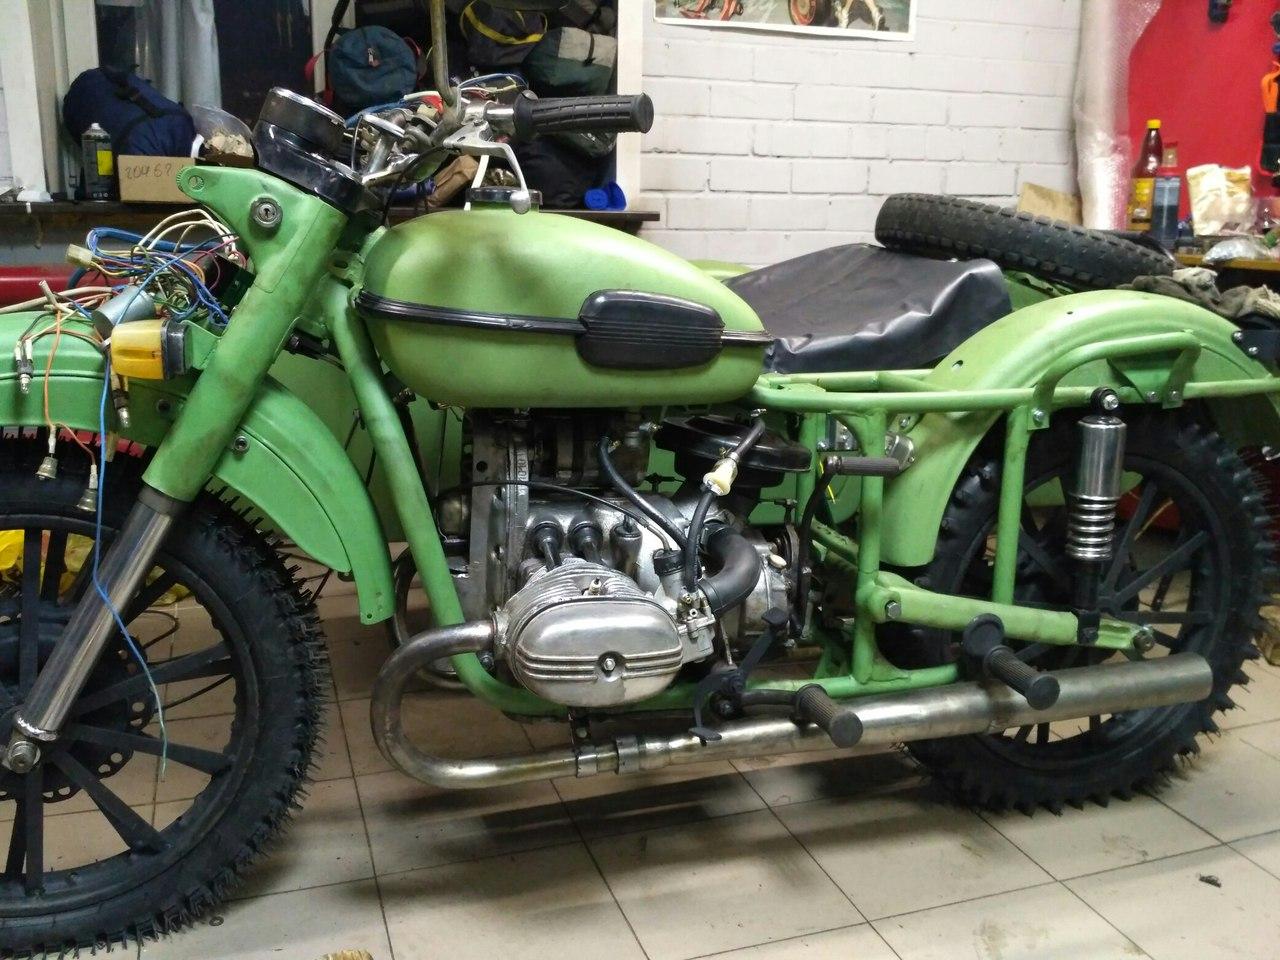 Тюнинг мотоцикла урал фото галереи